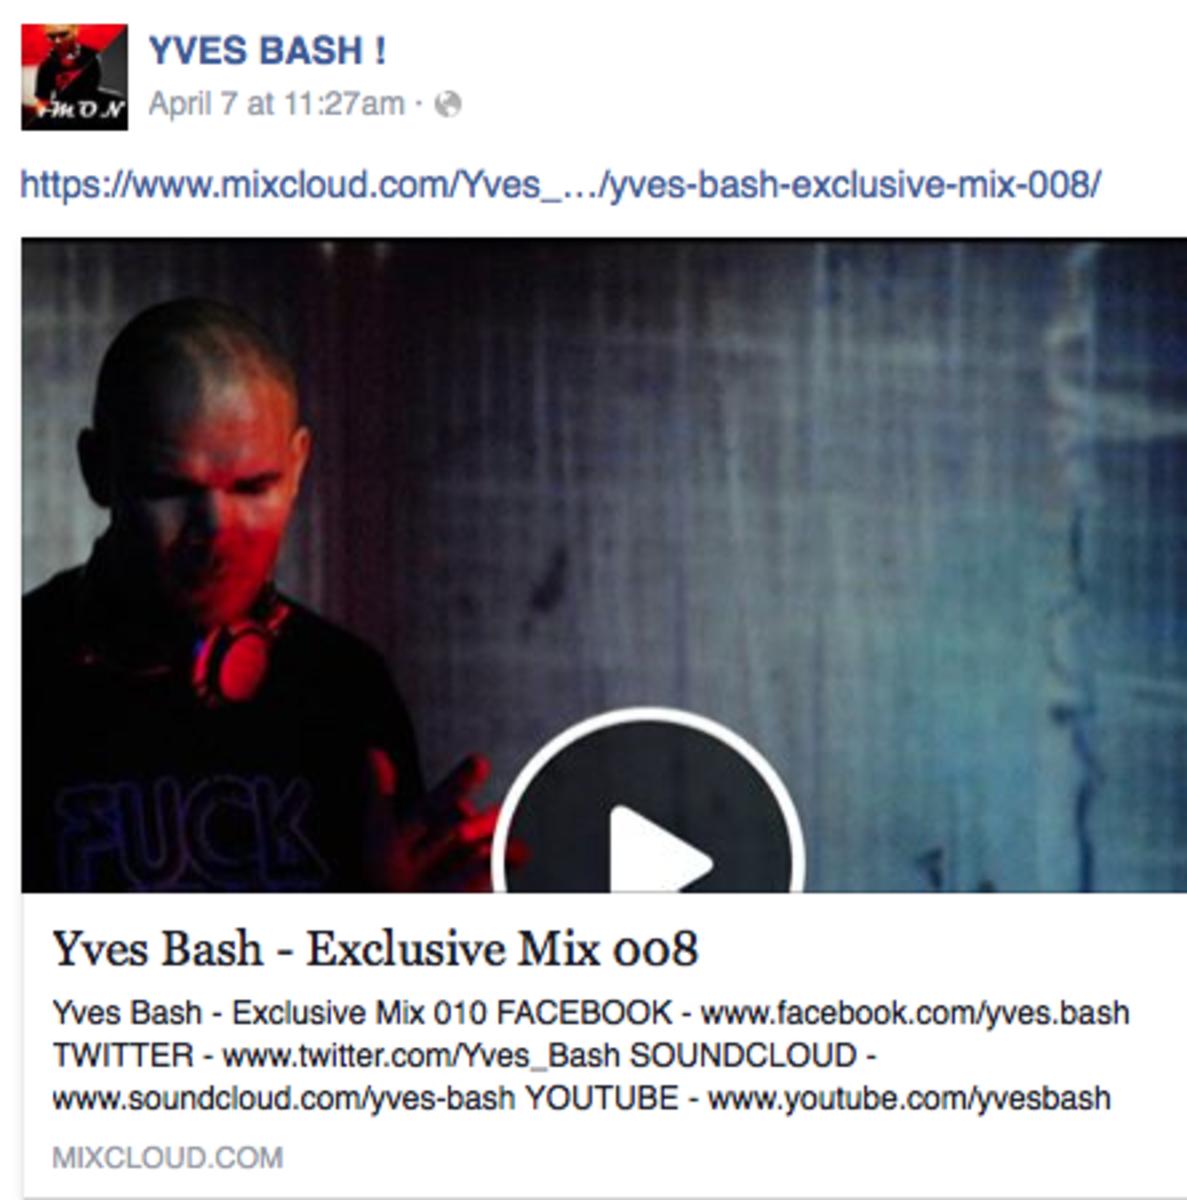 Yves Bash Mixcloud